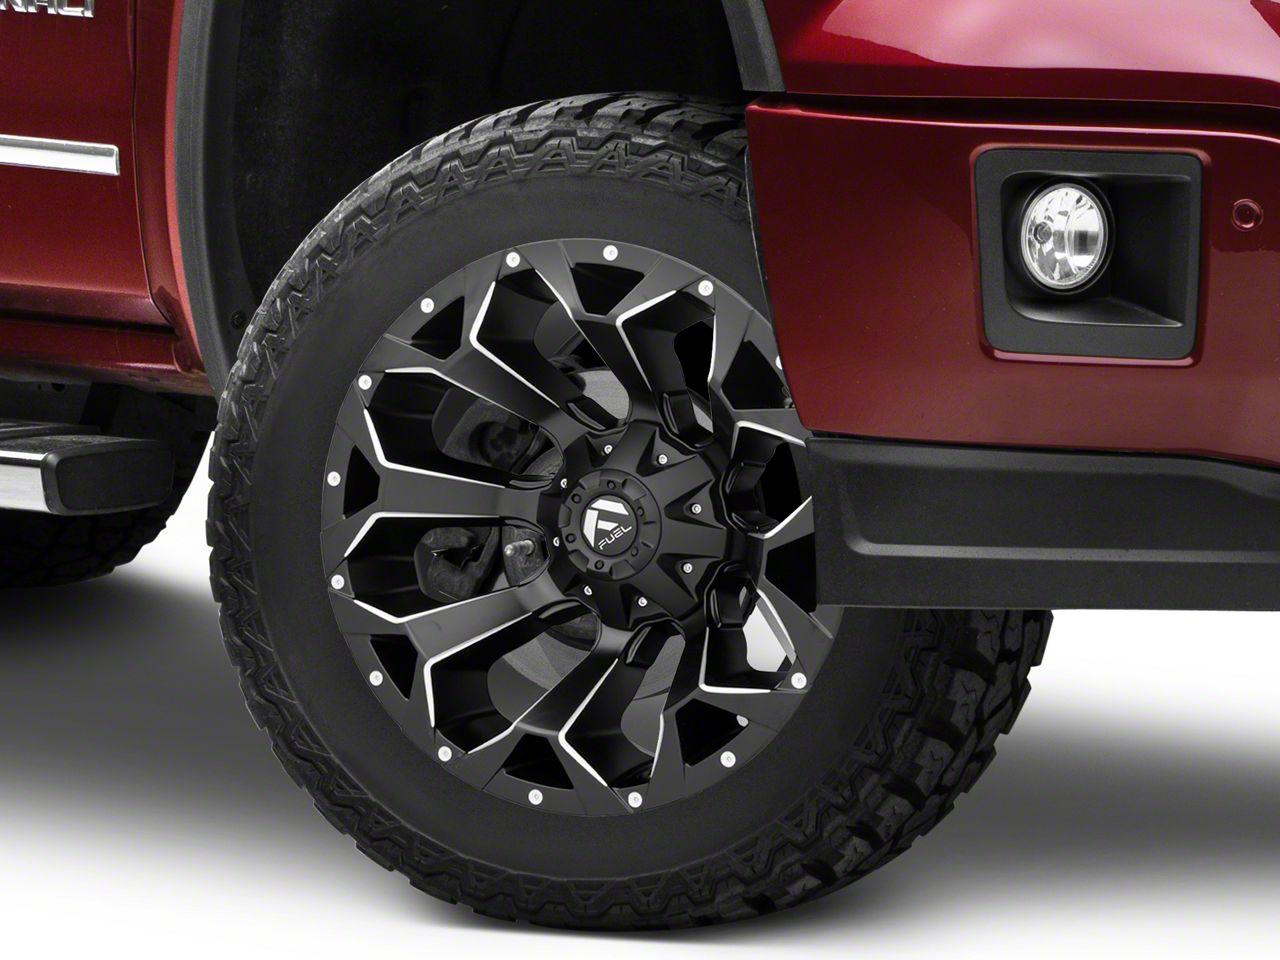 Fuel Wheels Assault Black Milled 6-Lug Wheel - 20x12 (07-18 Sierra 1500)